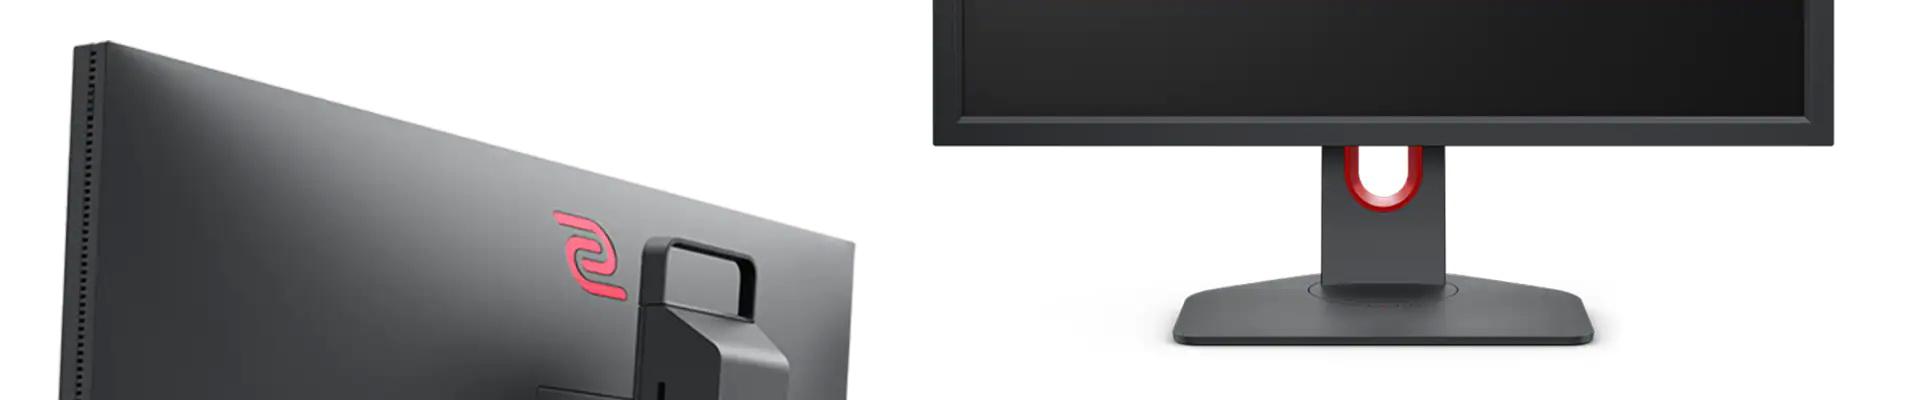 ZOWIE XL-K Series